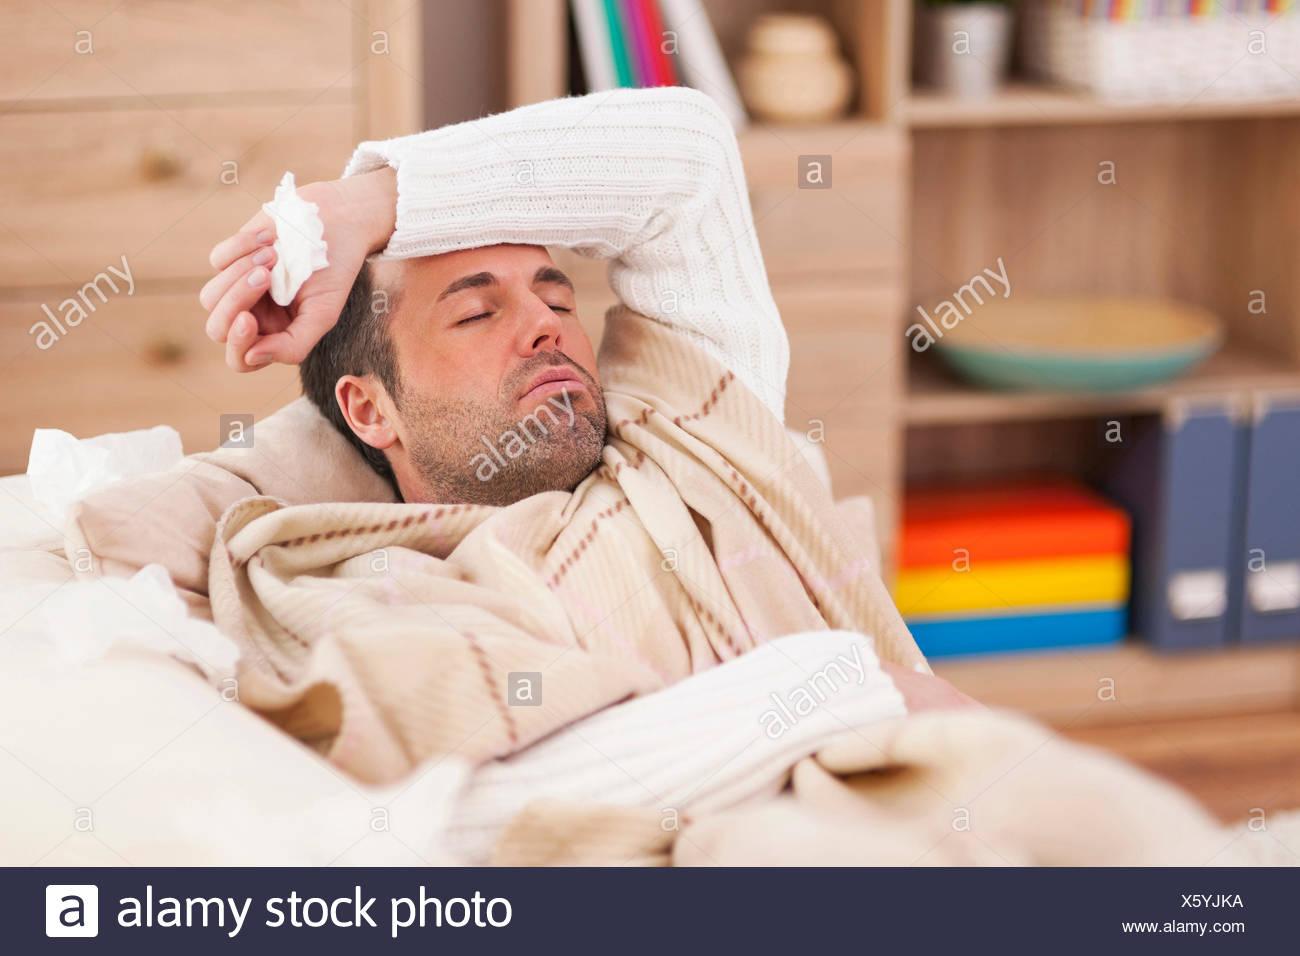 Man lying on the sofa, sick - Stock Image